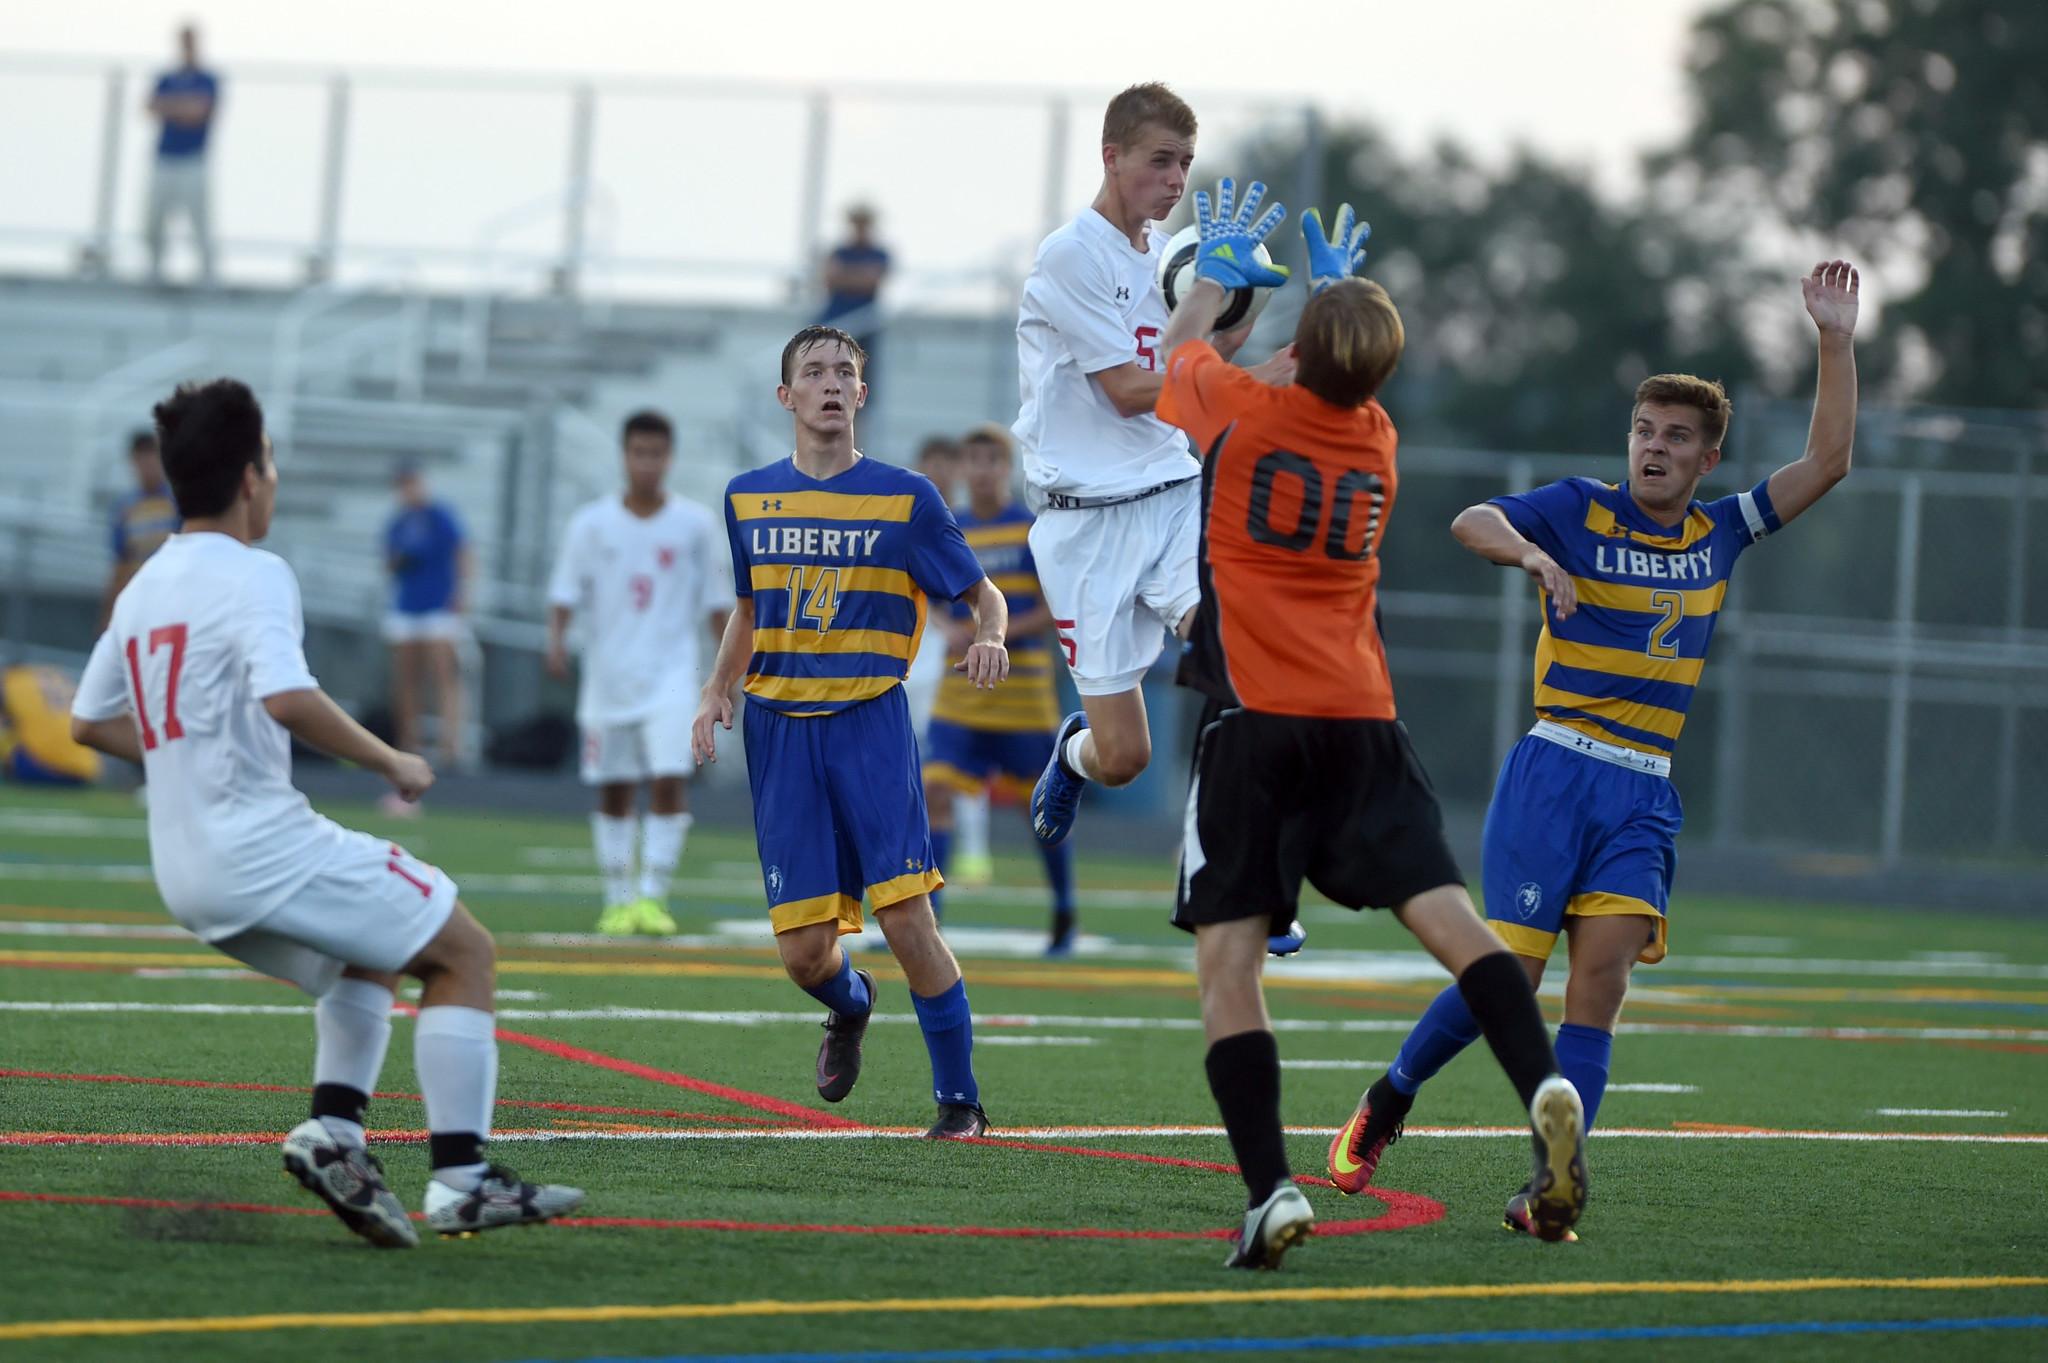 Oneto hat trick pushes Liberty boys soccer past Centennial ...